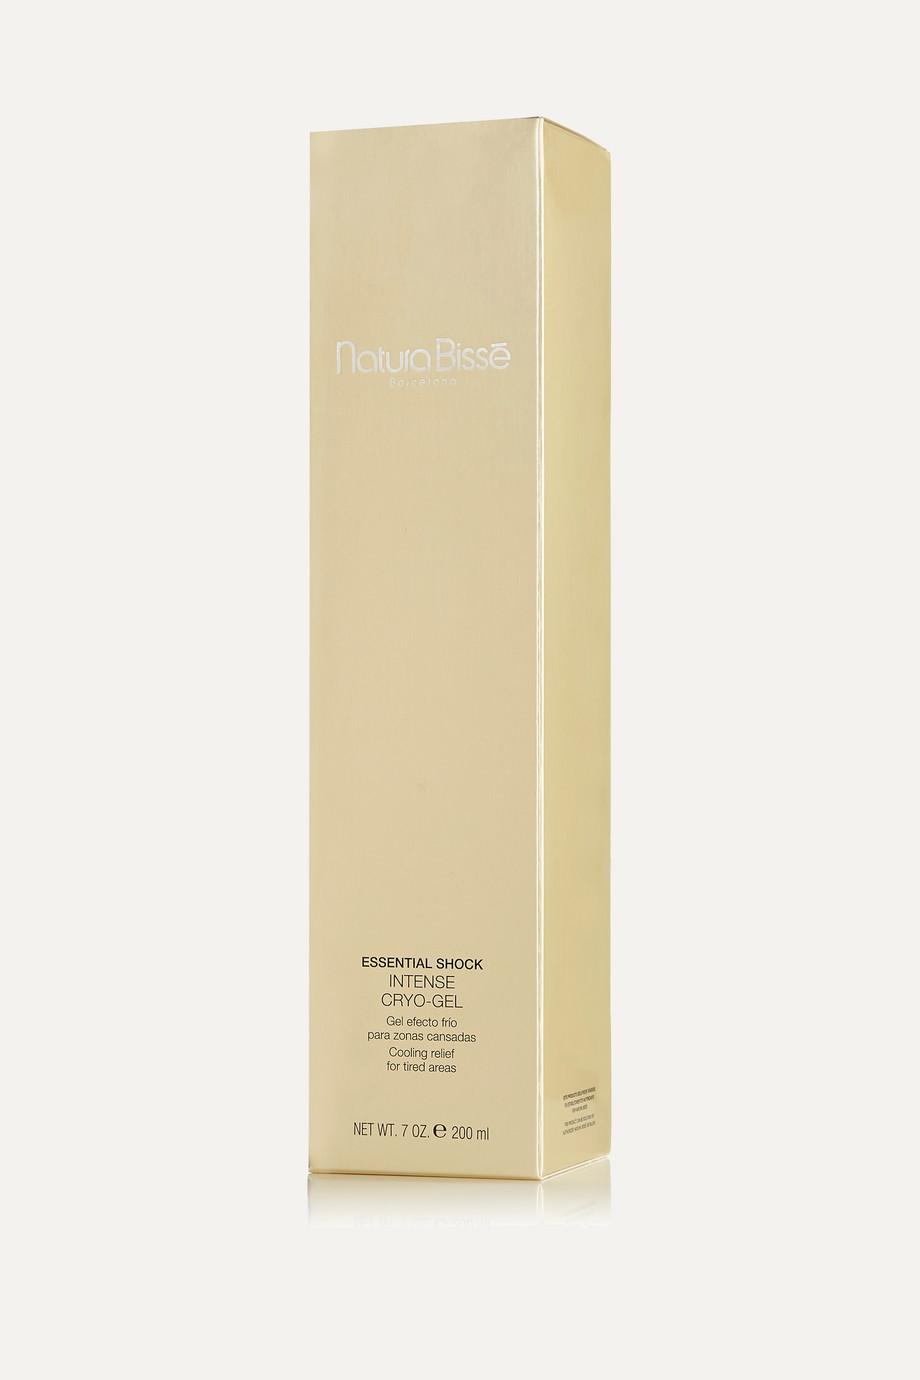 Natura Bissé Essential Shock Intense Cryo-Gel, 200 ml – Körpergel